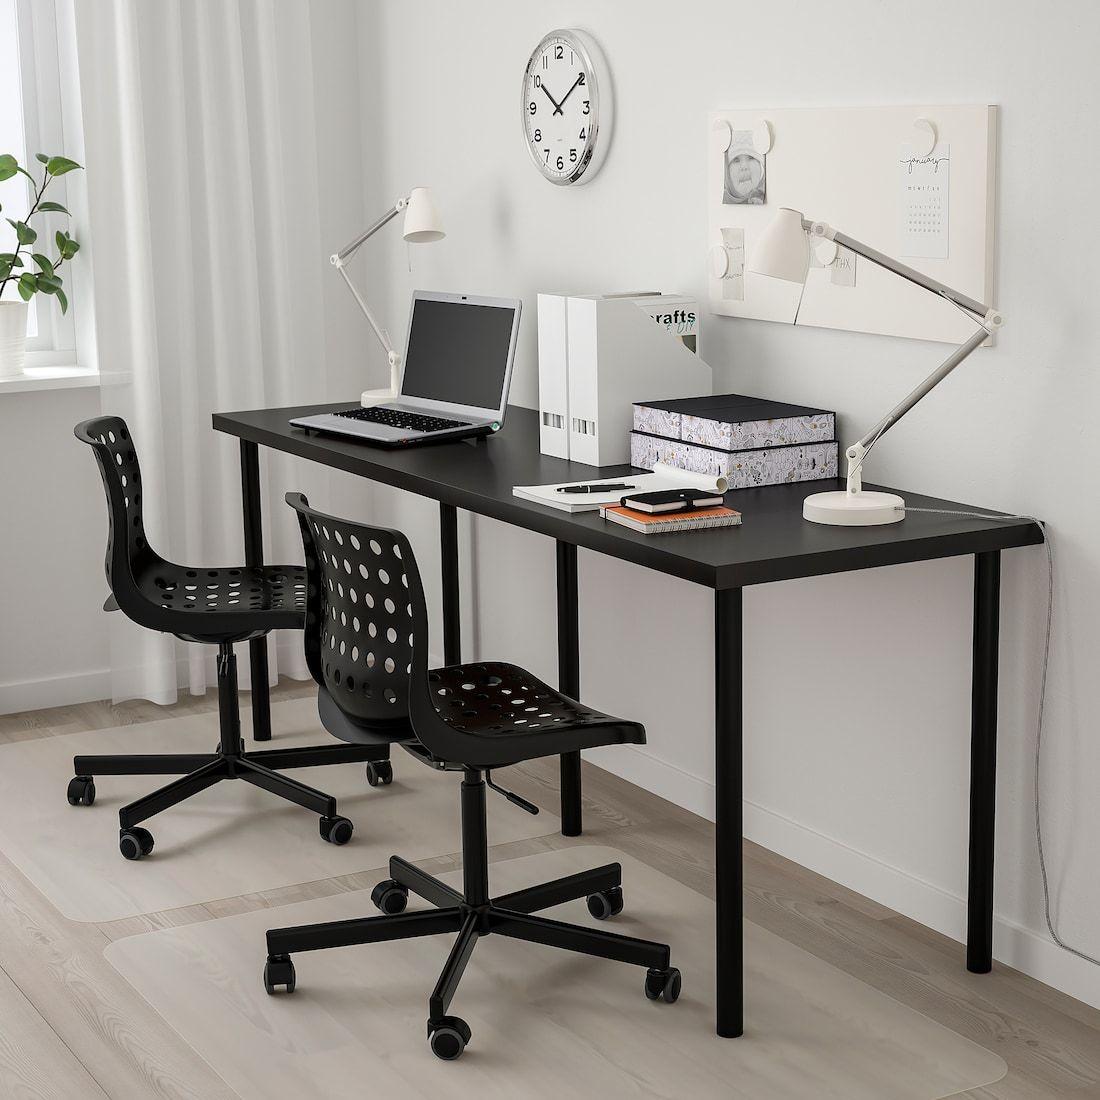 Linnmon Adils Table Black Brown Black 78 3 4x23 5 8 Ikea Home Office Design Home Office Setup Home Office Decor